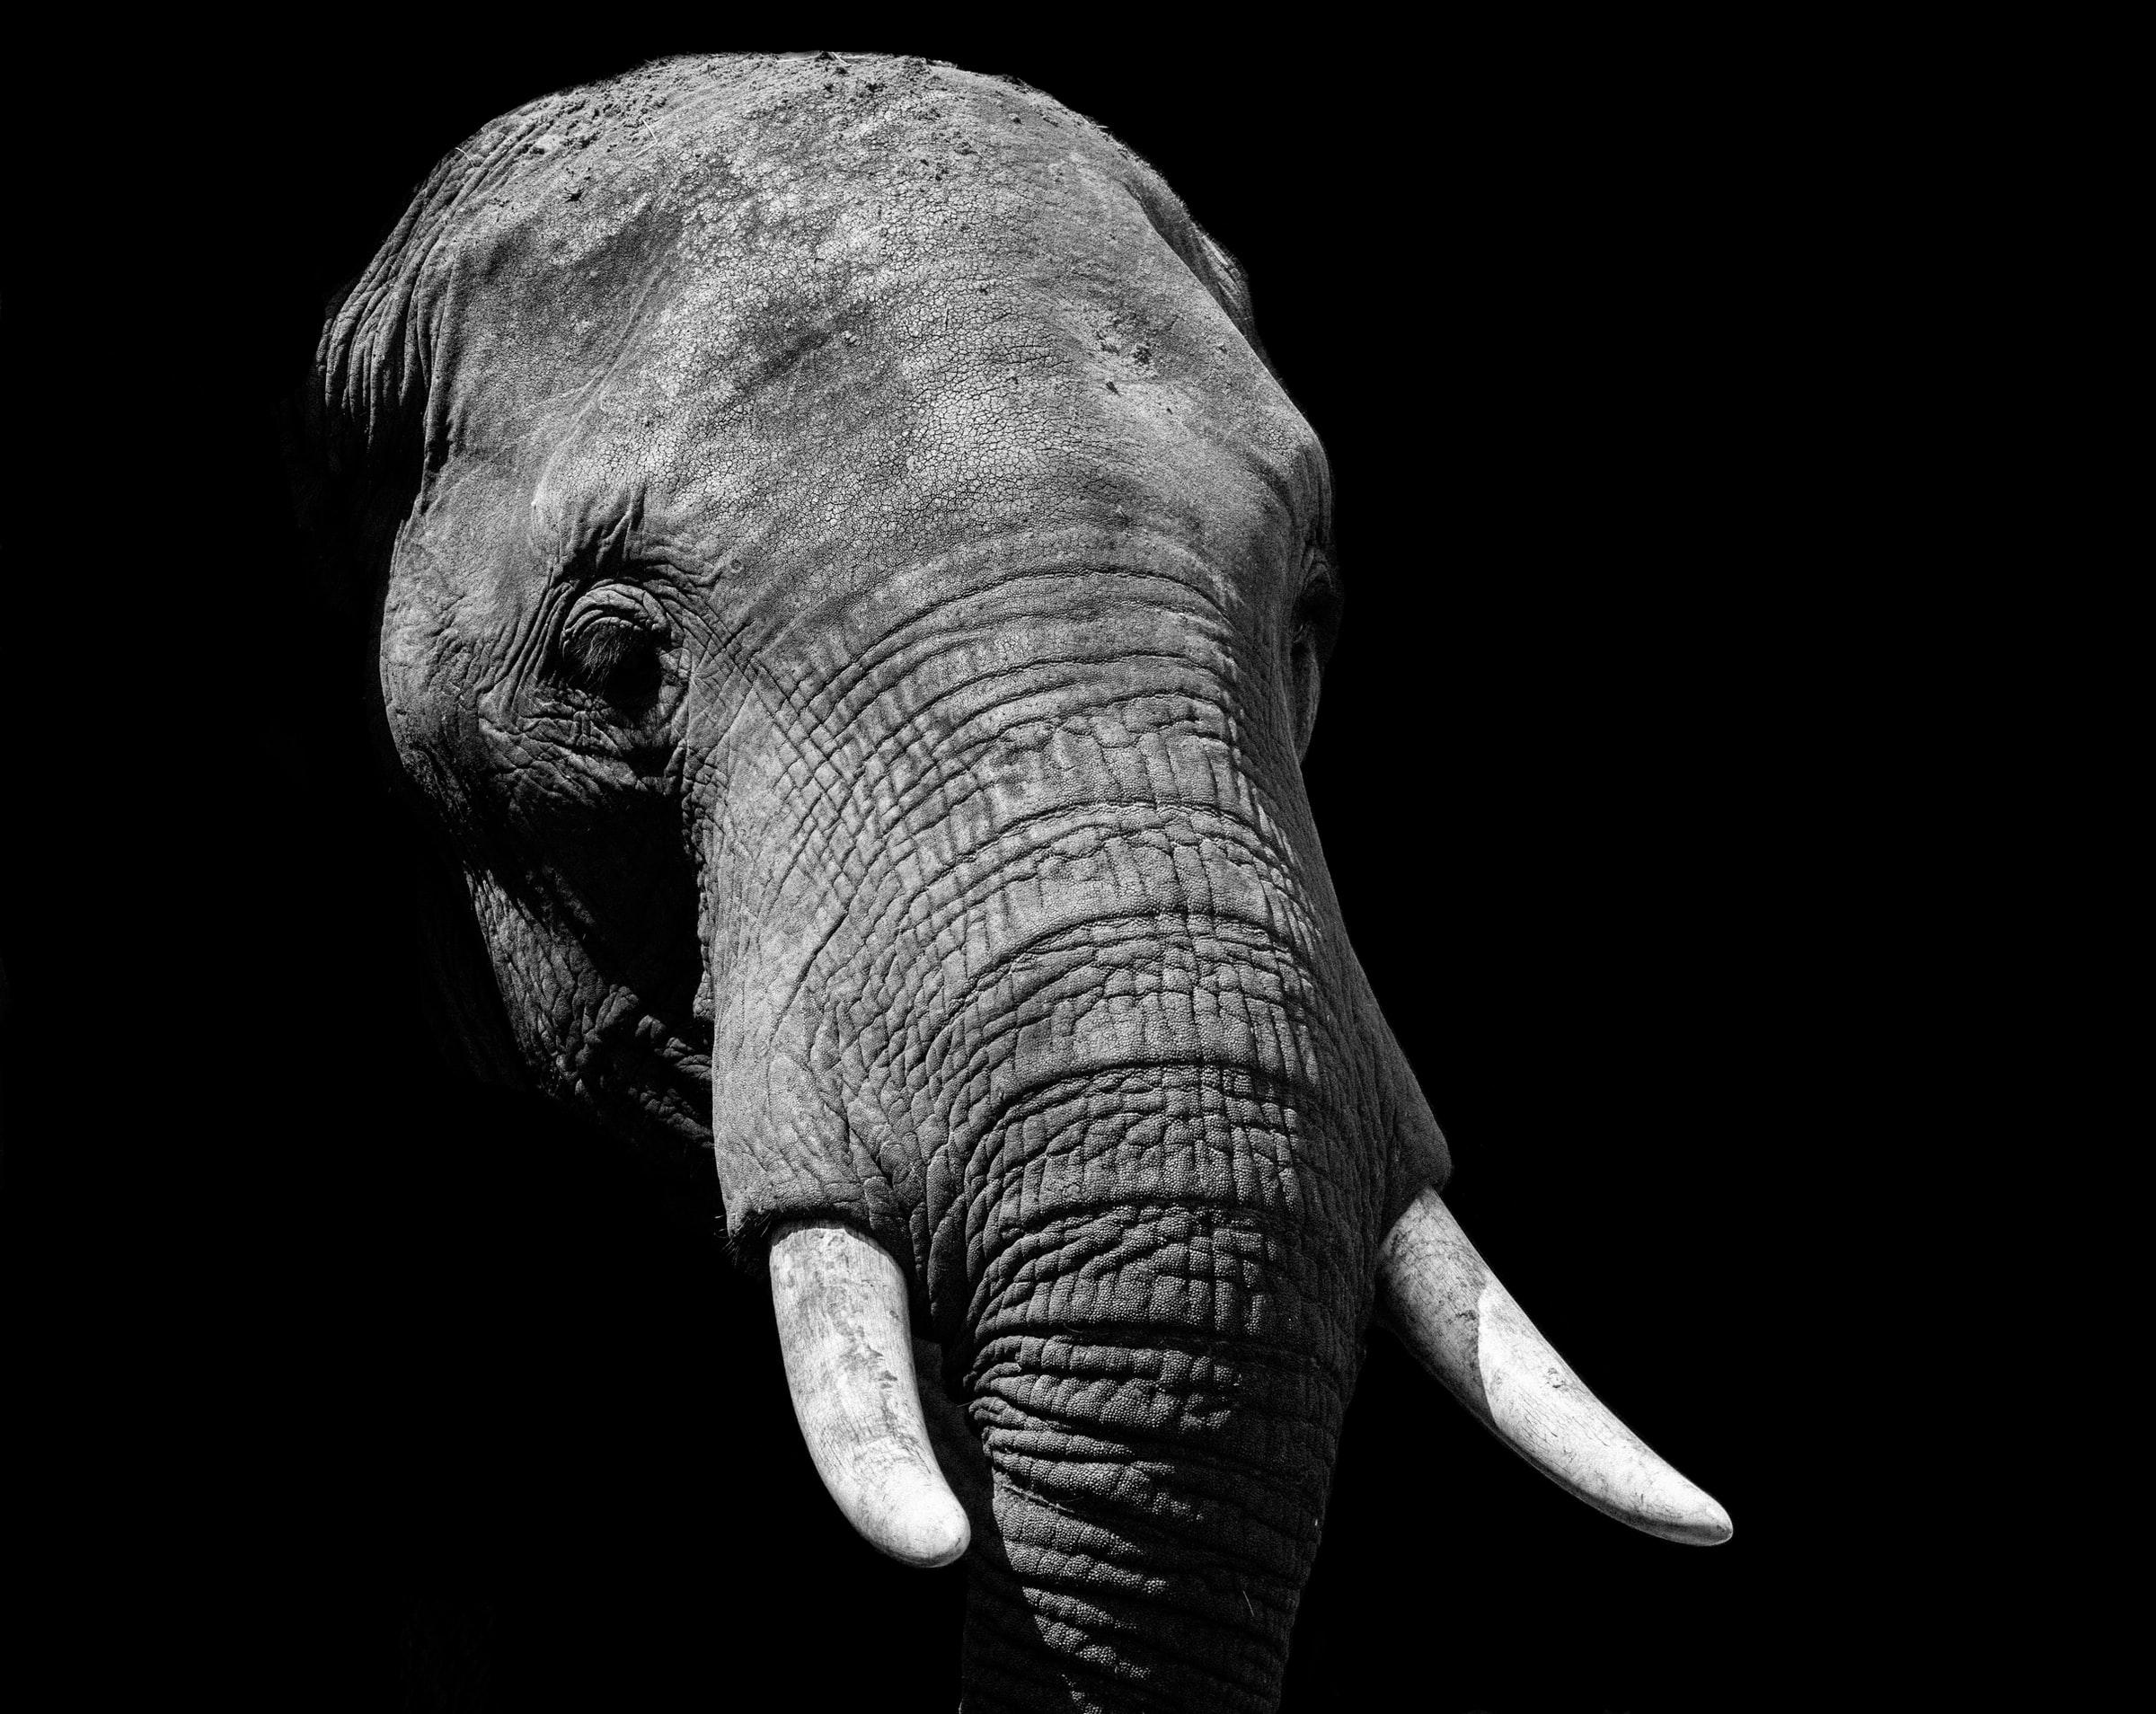 A shipwreck treasure reveals the tragic history of African elephants